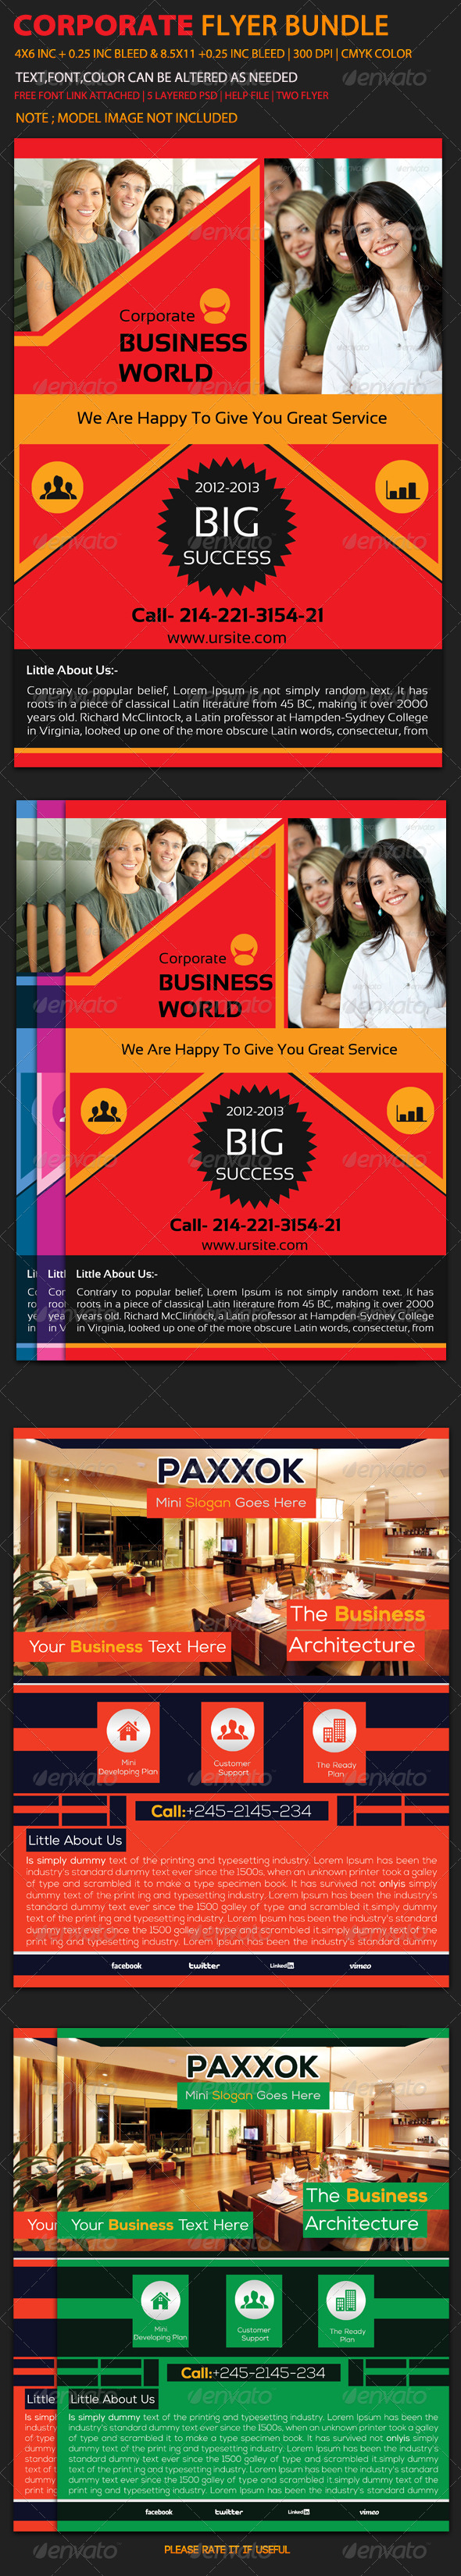 GraphicRiver Corporate Flyer Bundle 1 6059255